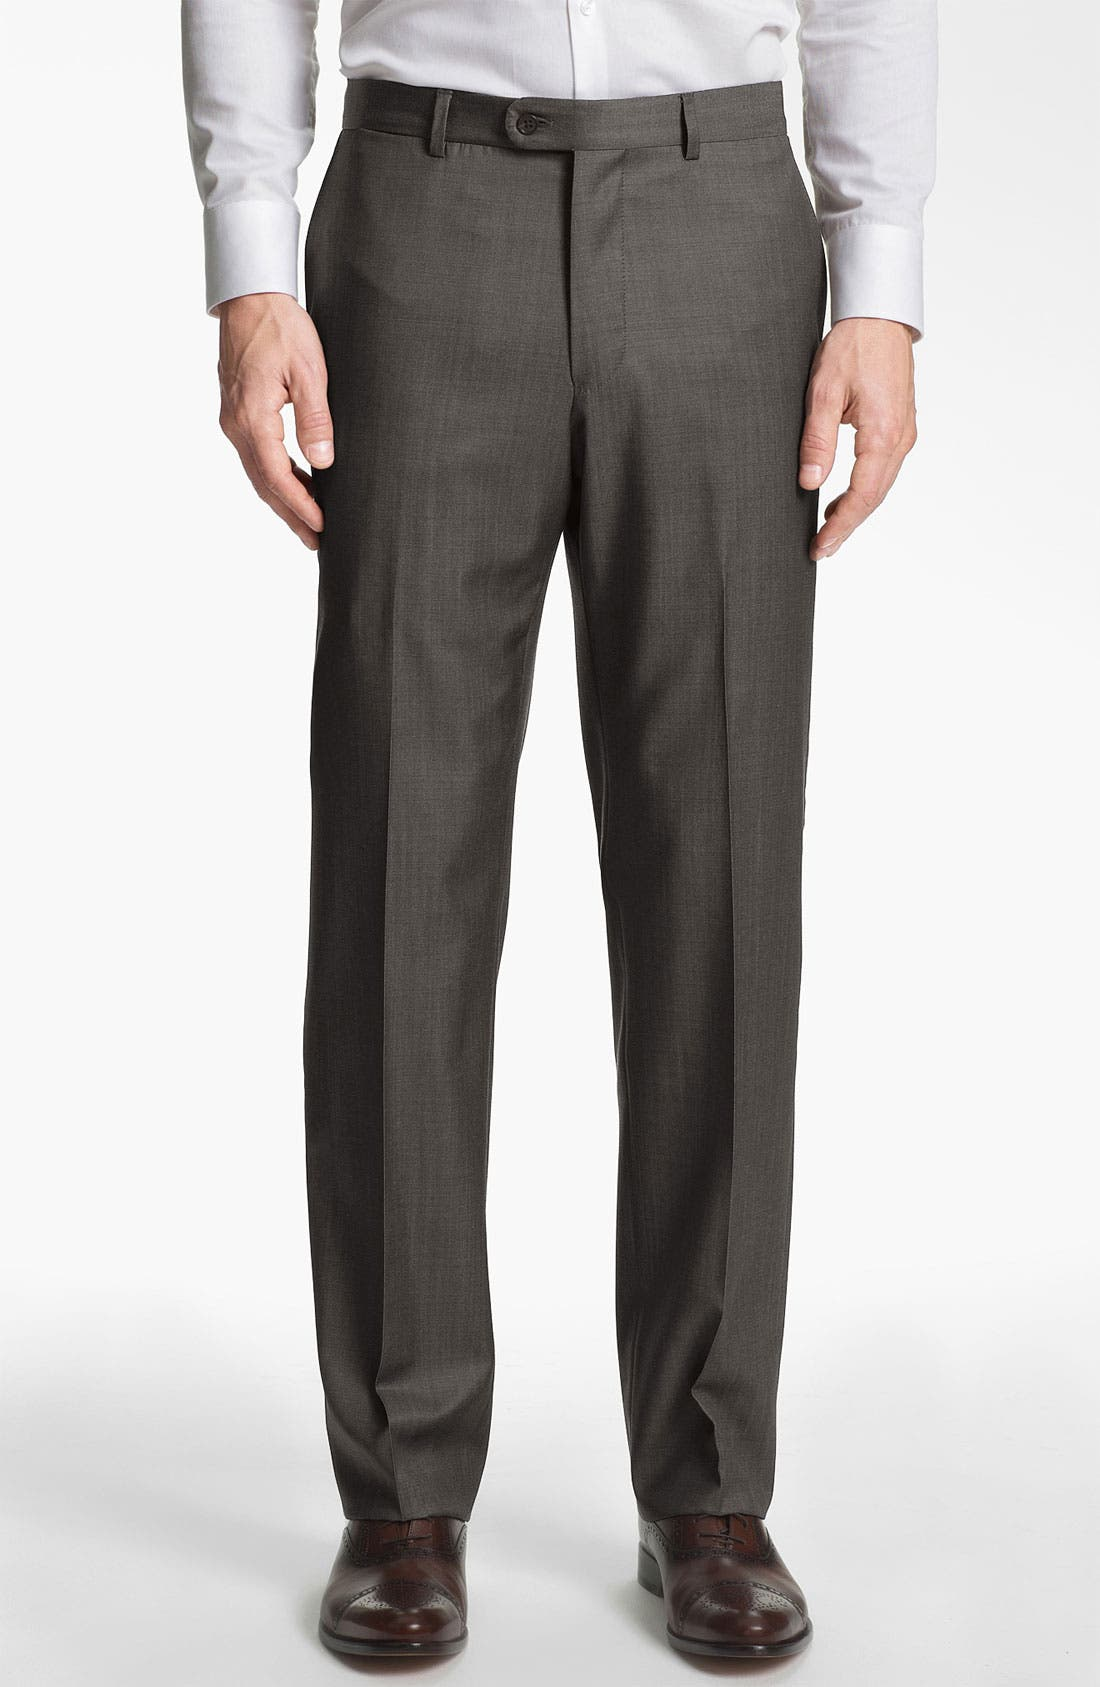 Main Image - Joseph Abboud Flat Front Trousers